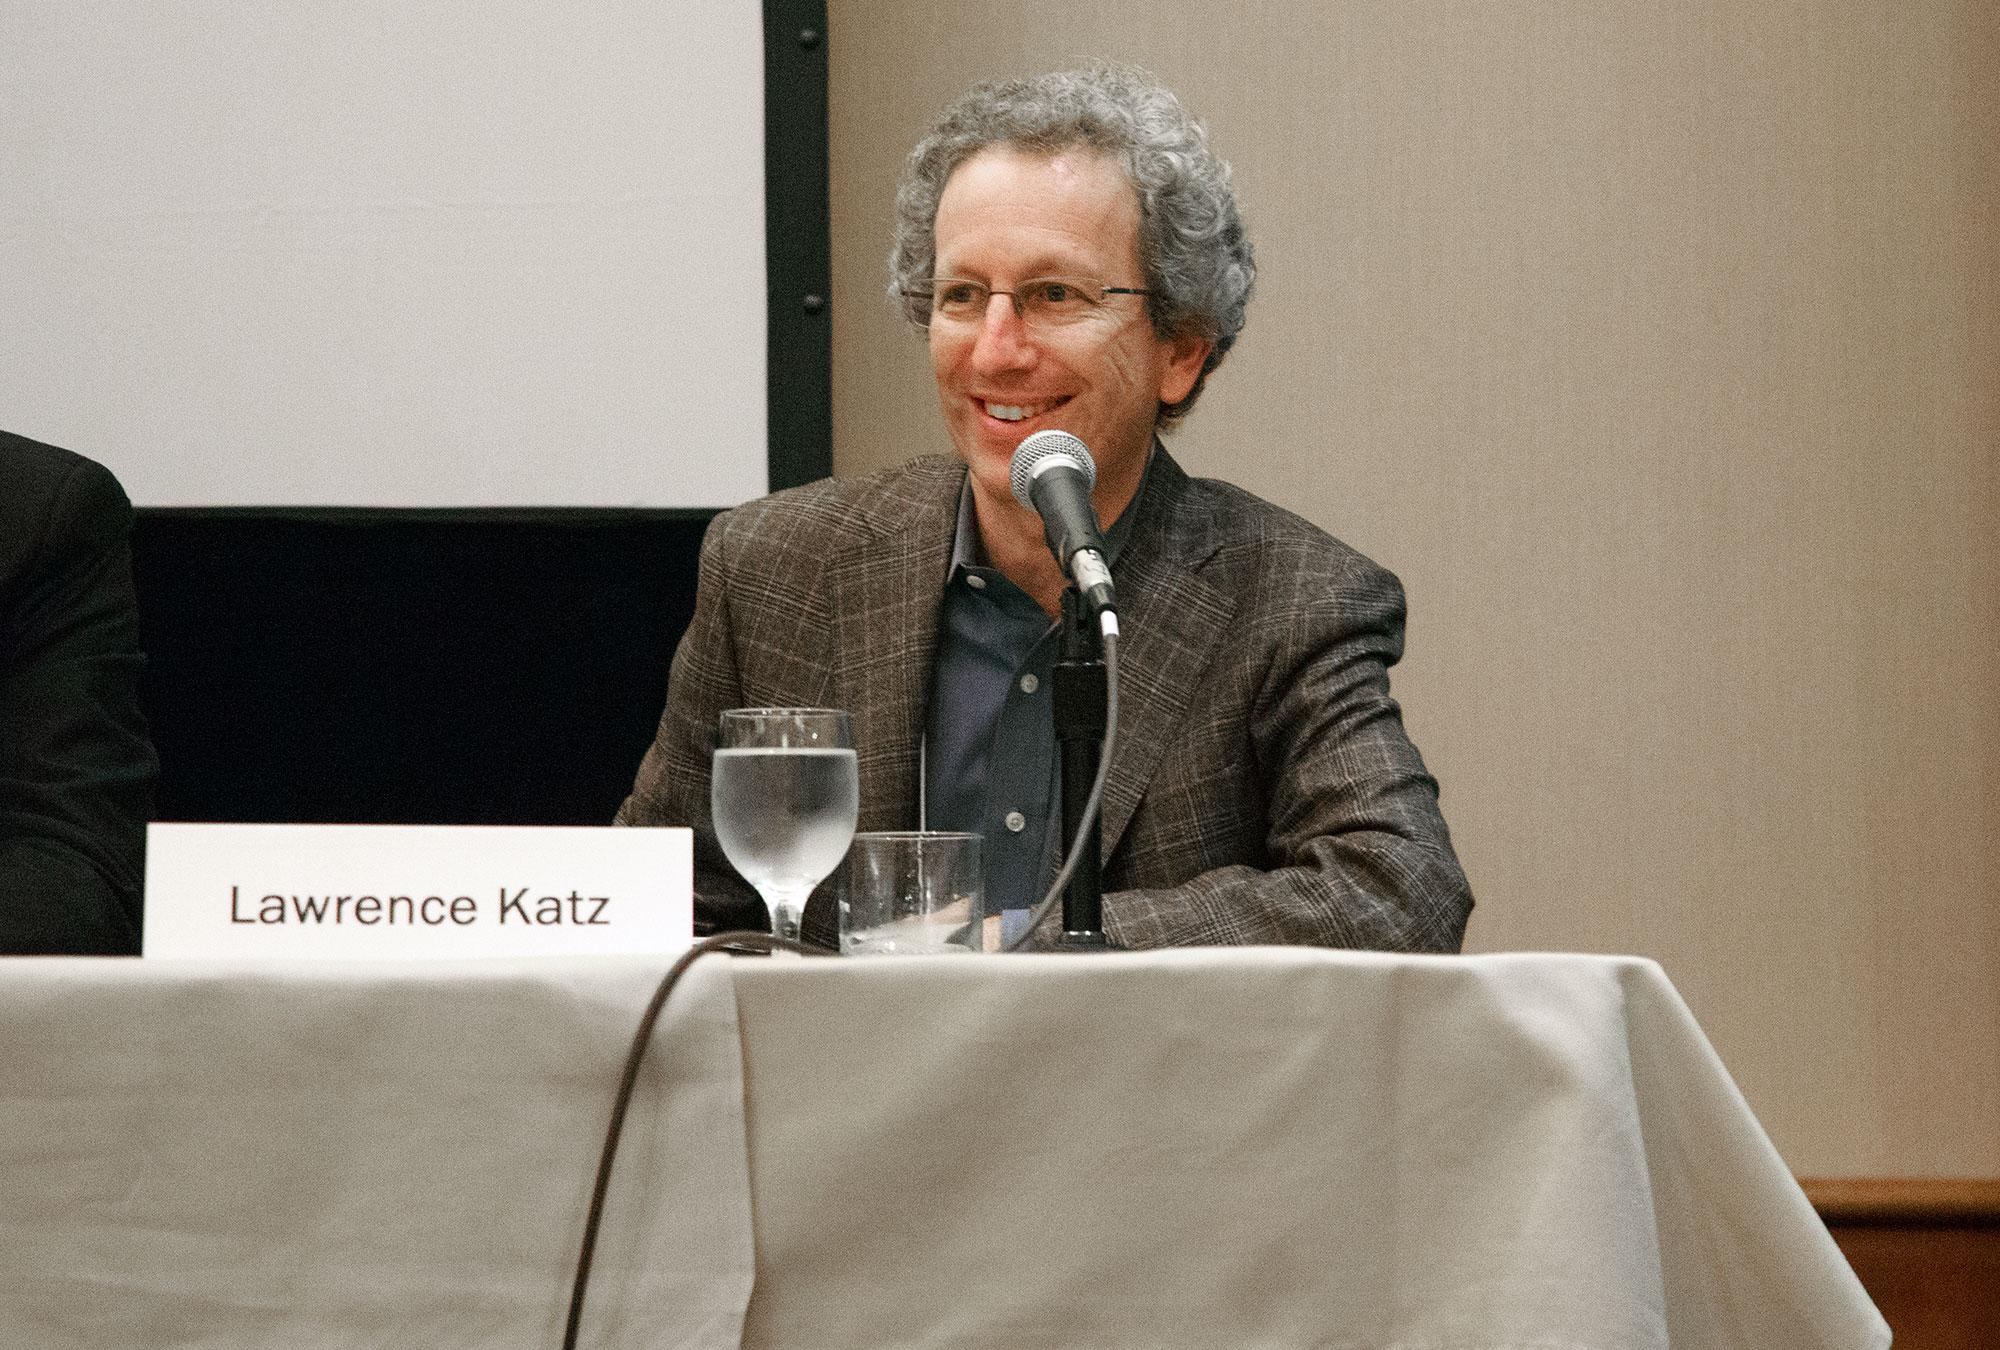 Larry Katz speaks on a panel